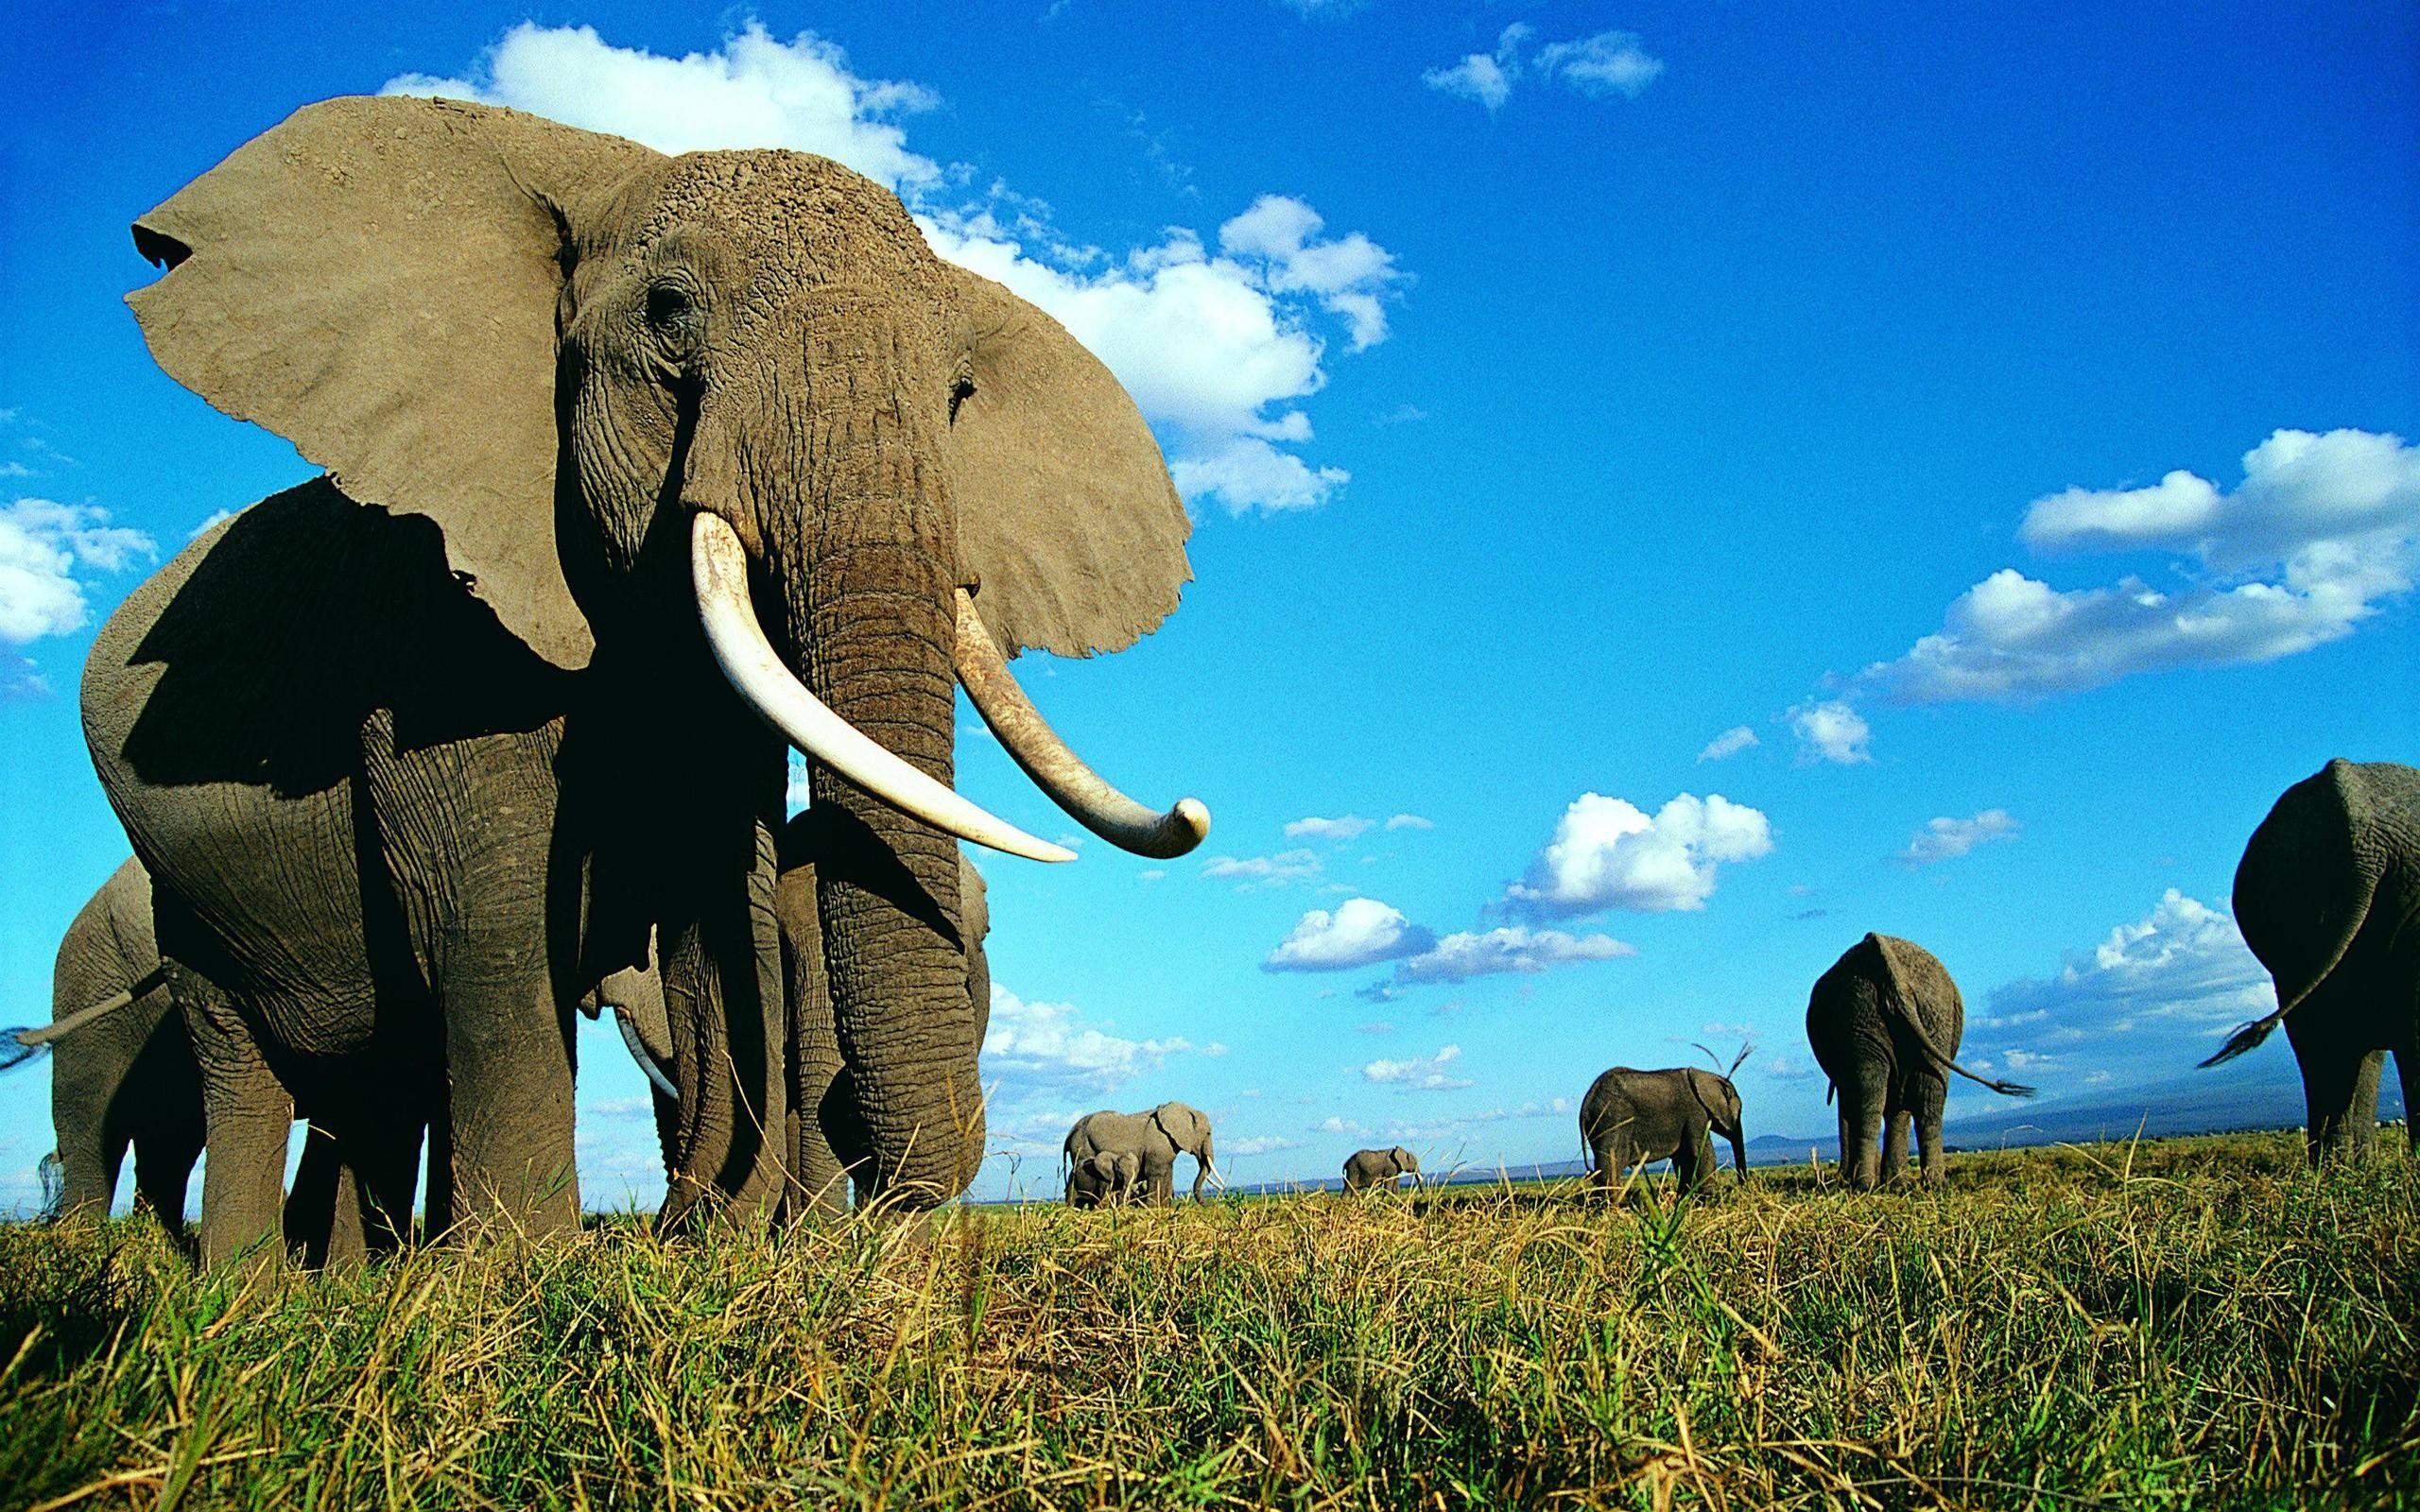 Elephants Background Page 1